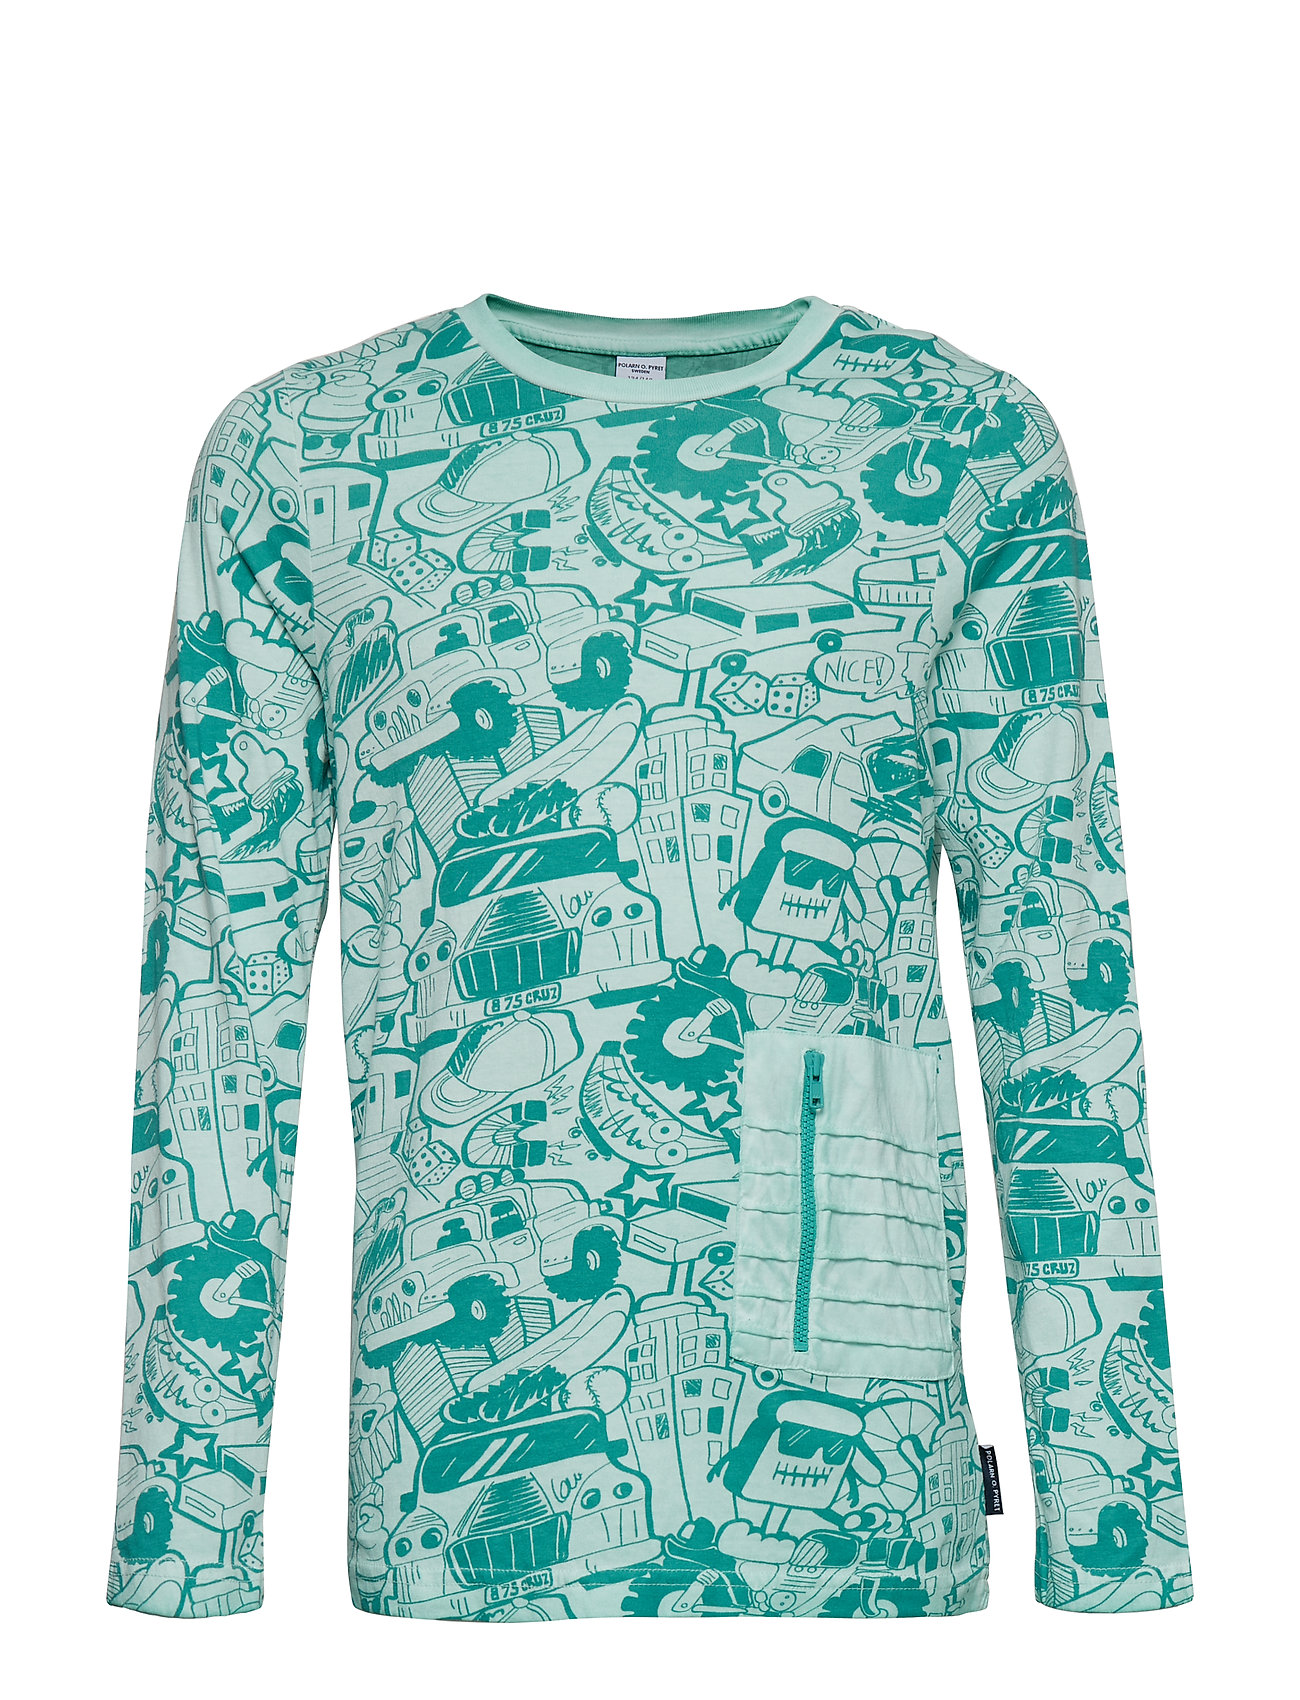 Polarn O. Pyret T-Shirt l/s  front print school